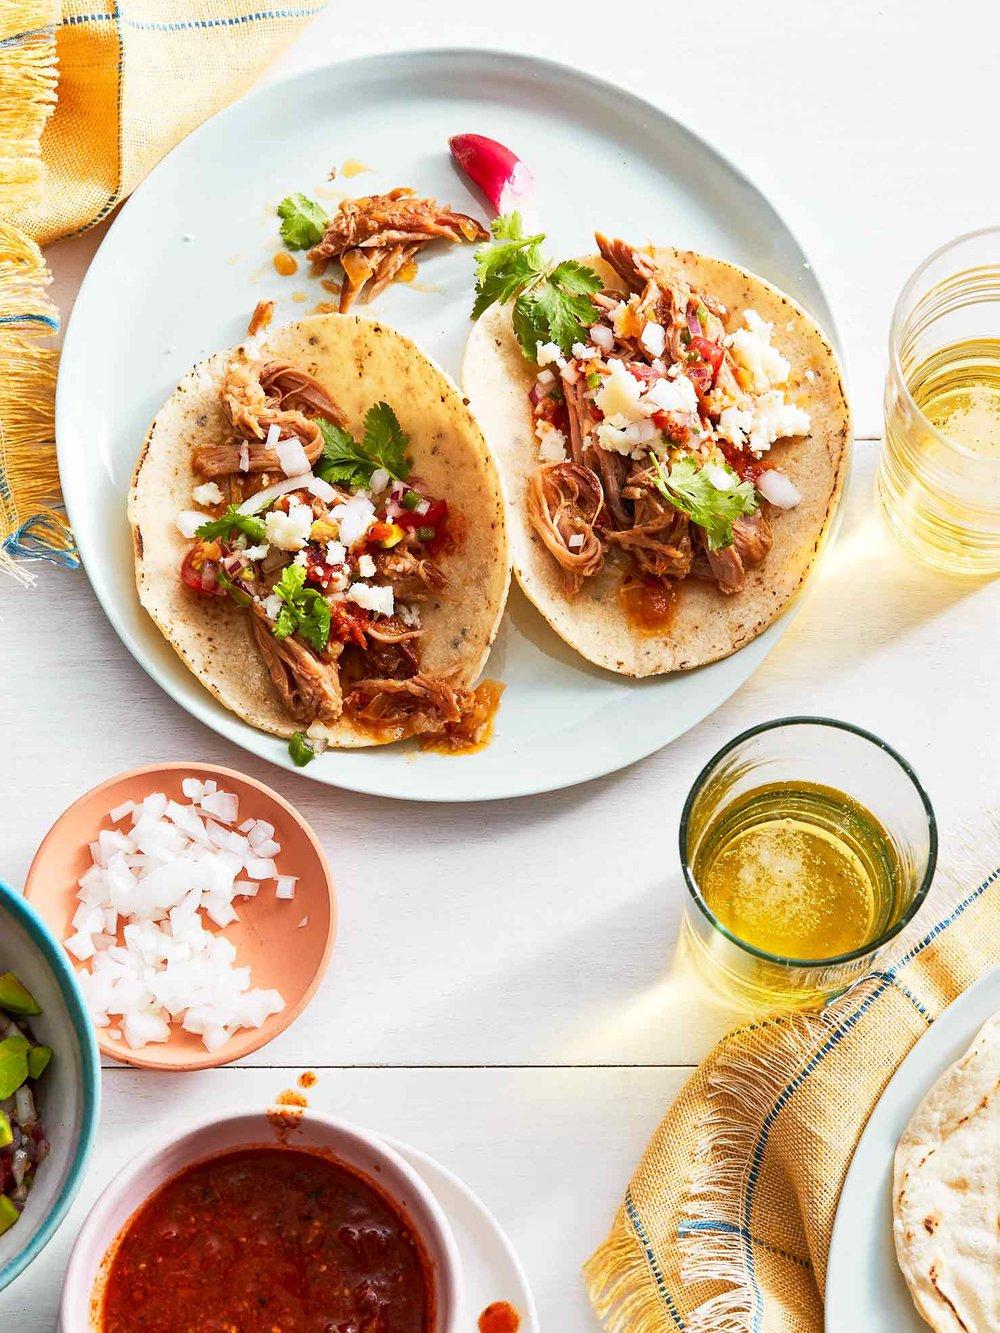 CHRONICLE_JM_Chipotle_Carnitas_Tacos_v2_hero.jpg